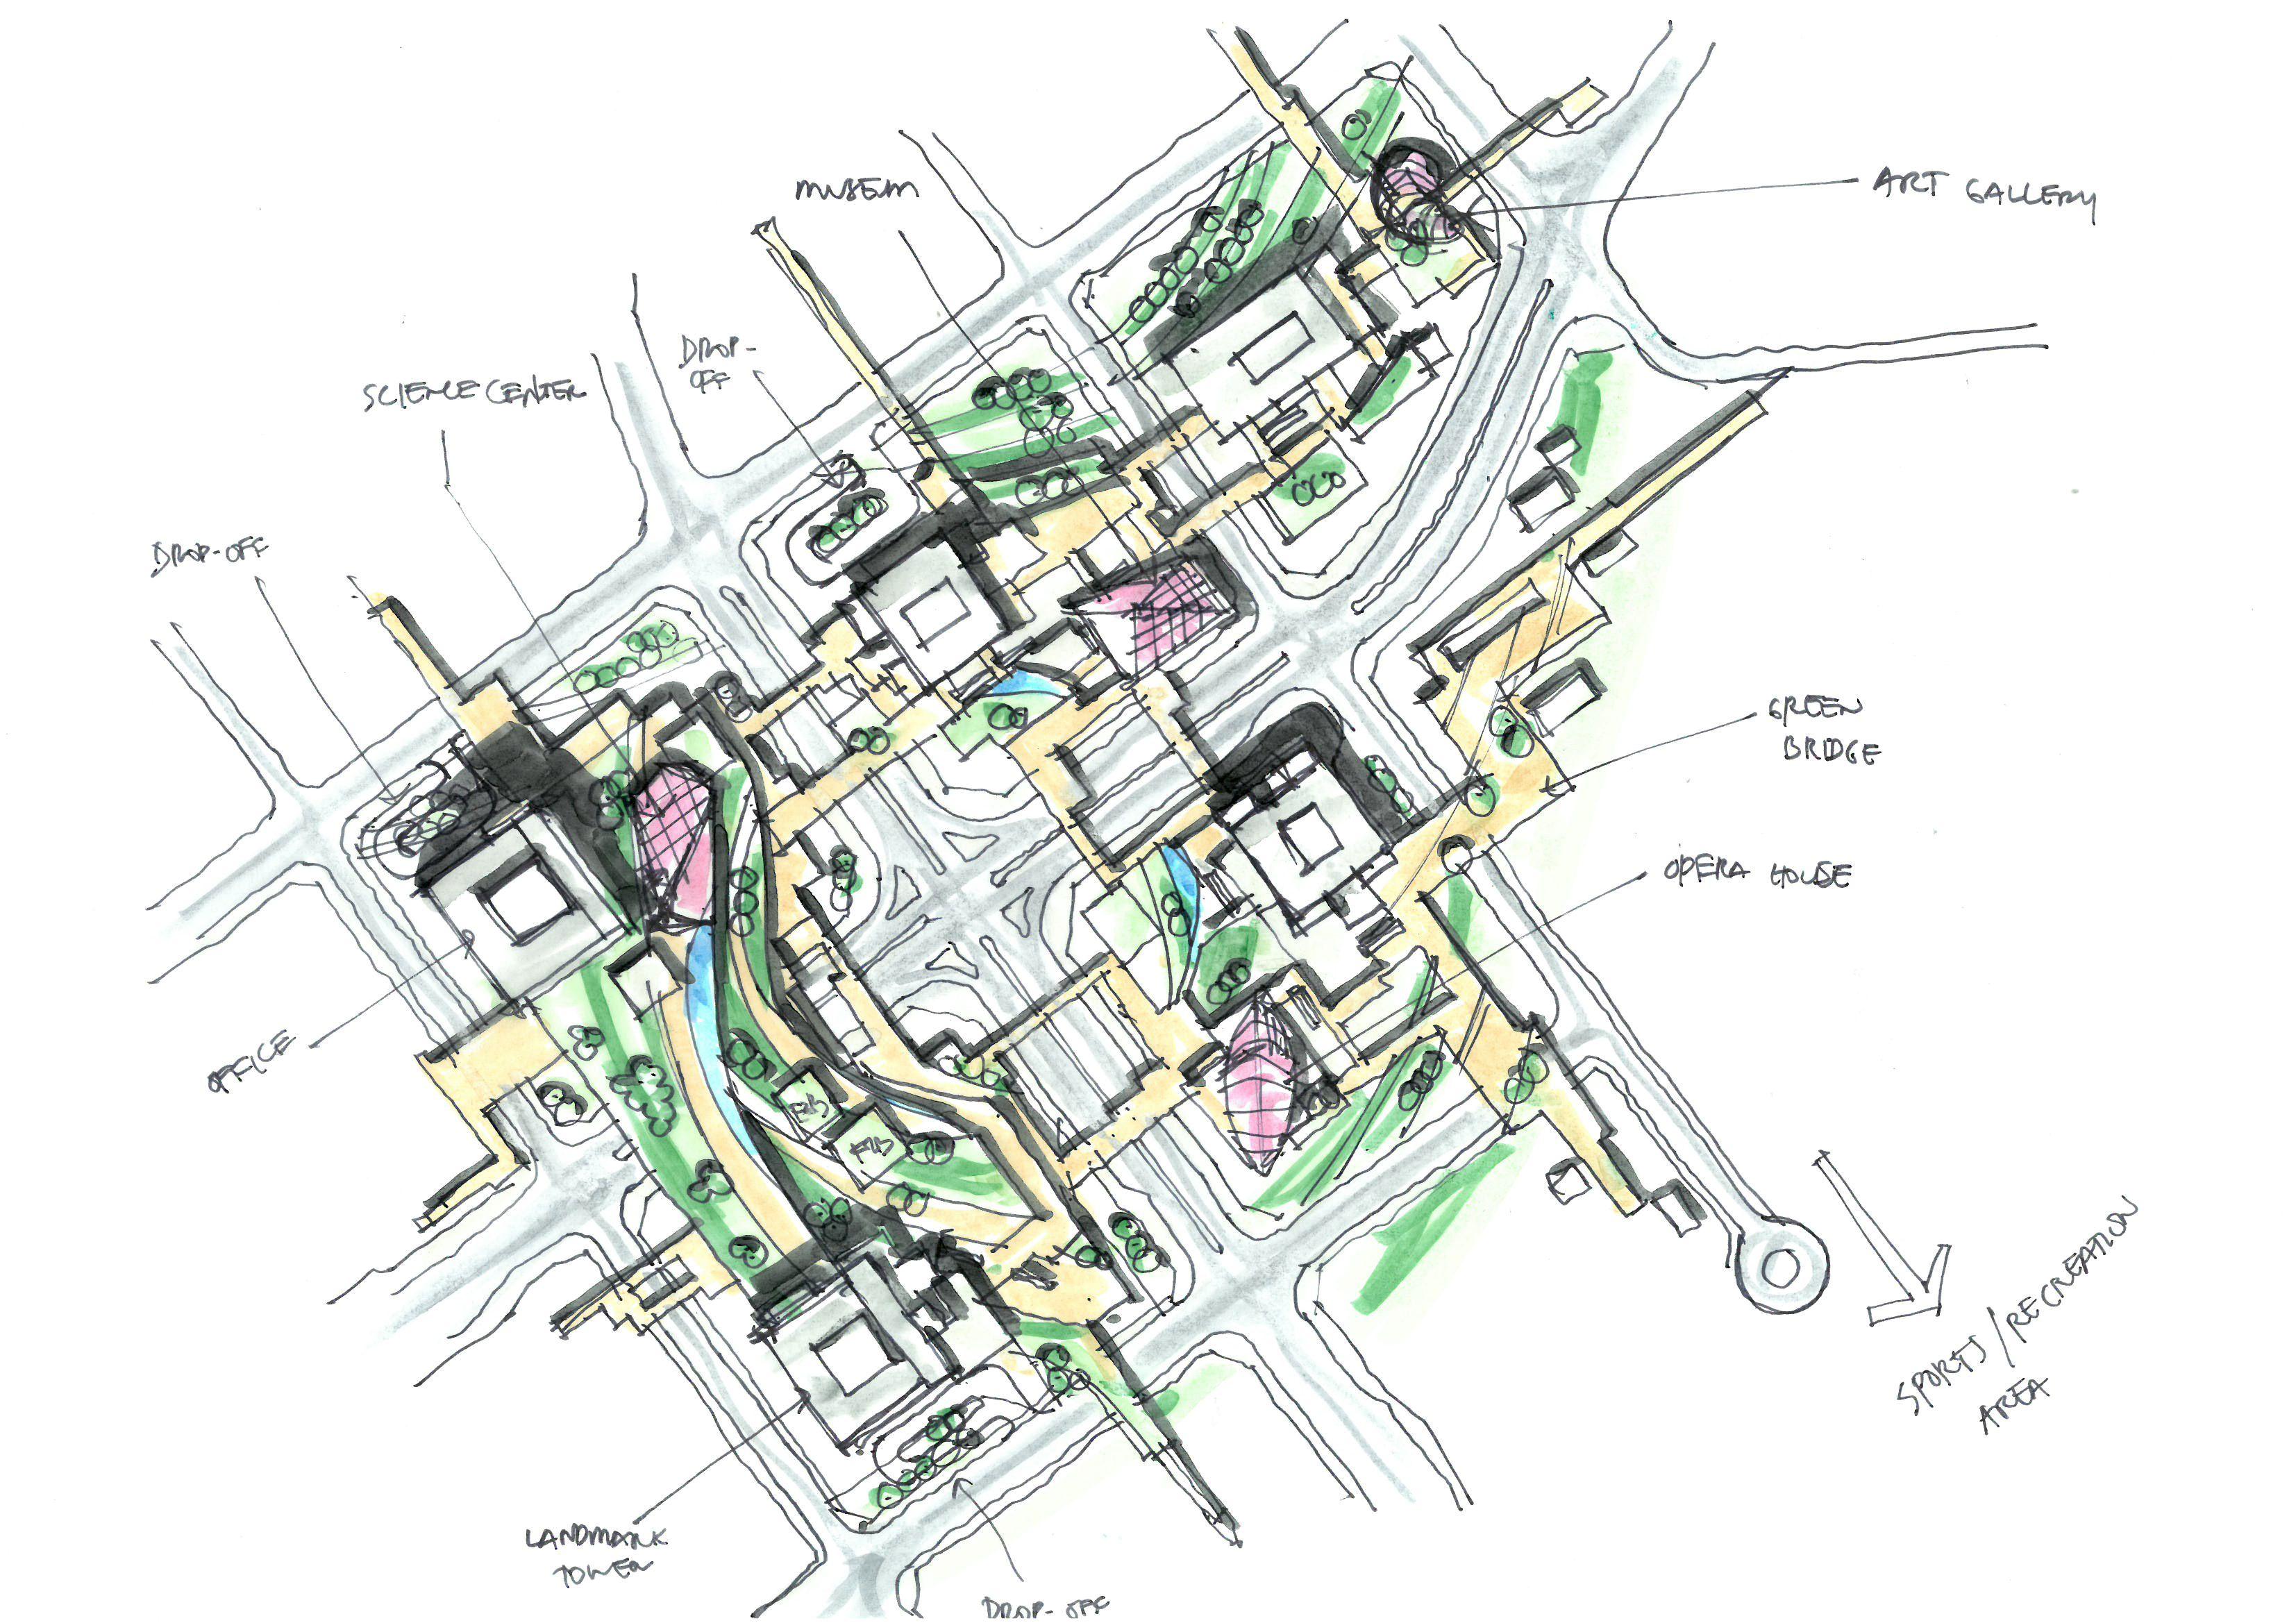 Mlp Sketch Randy Carizo Master Plan Site Plan Landscape Concept